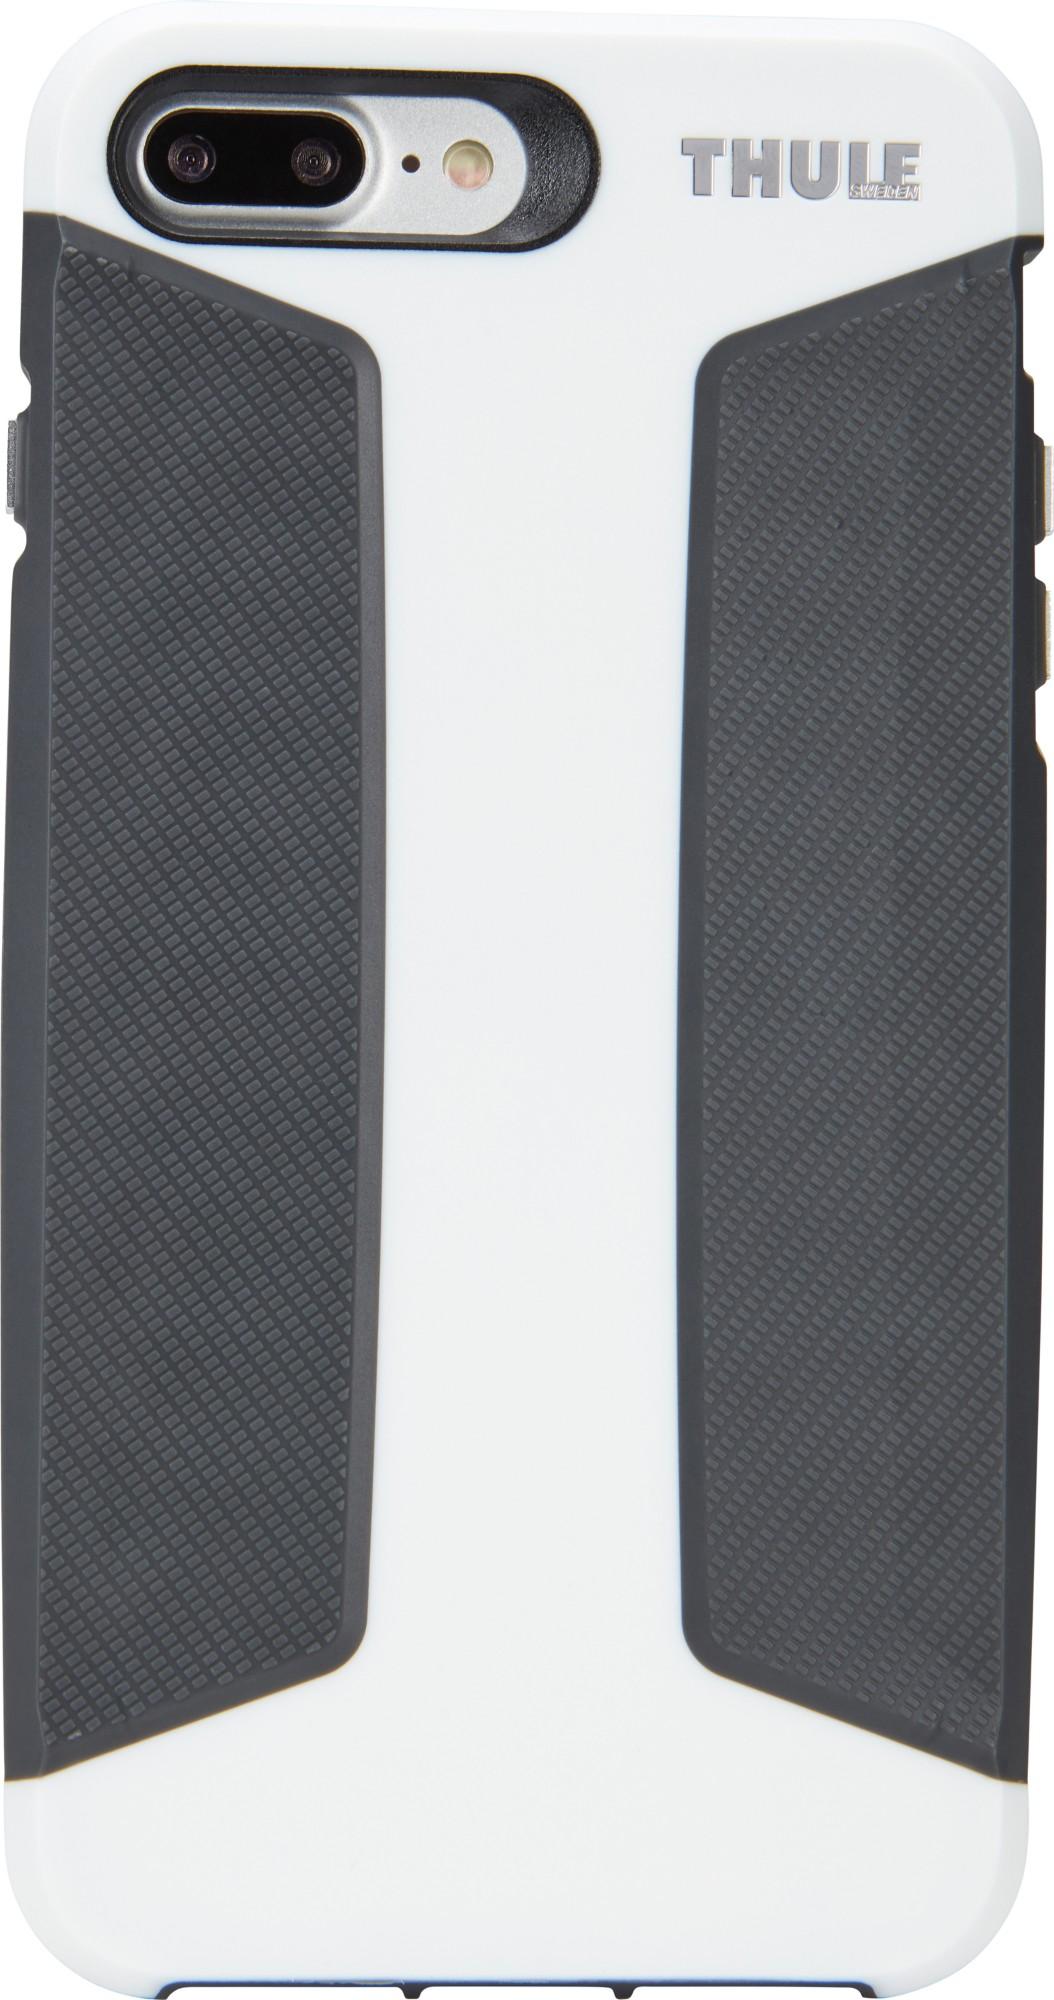 "Thule Atmos X3 mobile phone case 14 cm (5.5"") Cover Black,White"